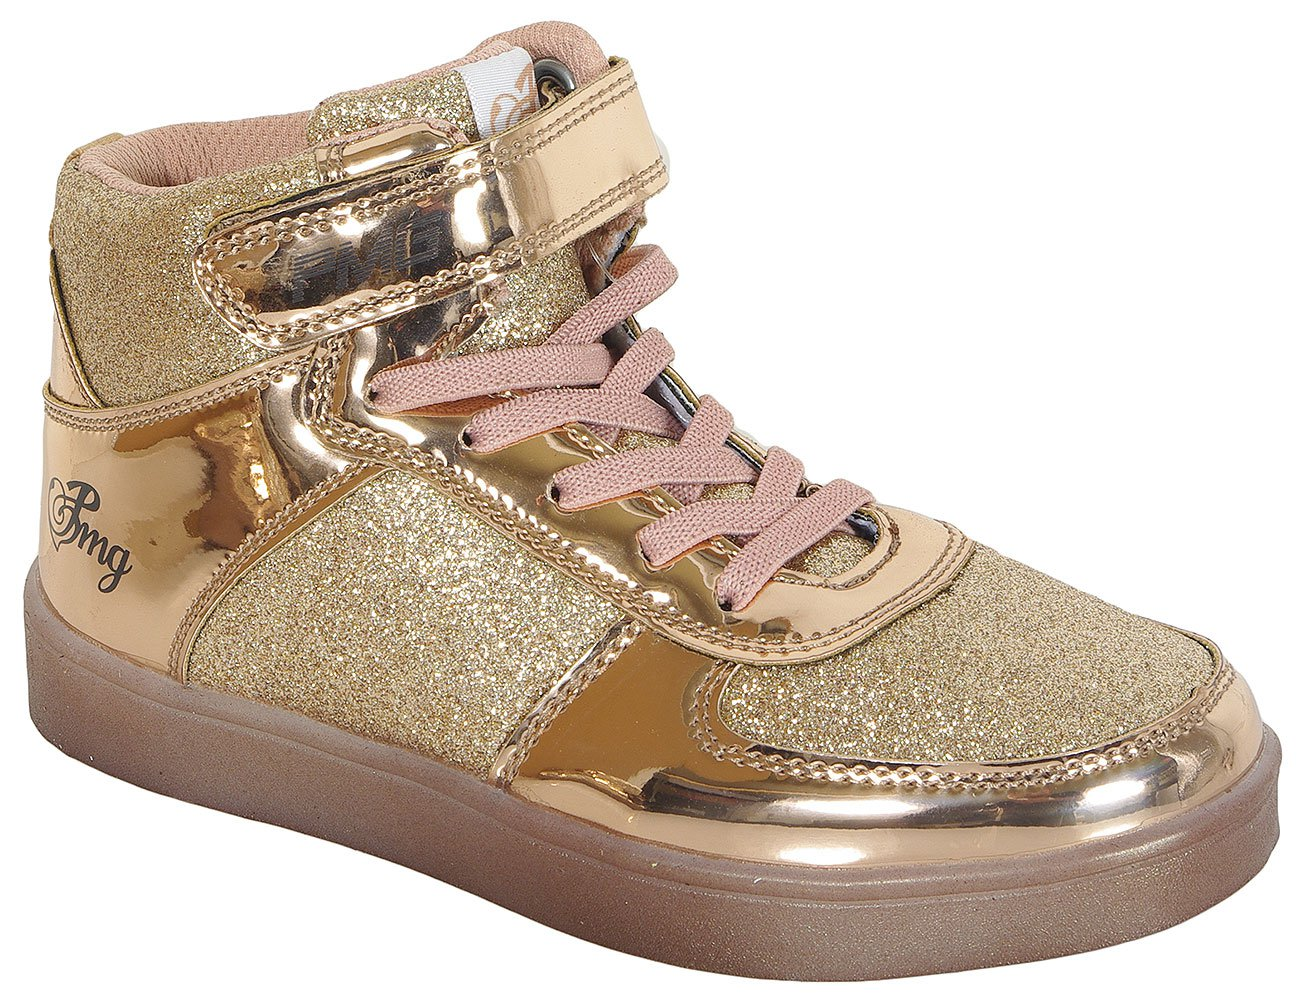 Primigi B&G Total Light Specchio/Glitt Cipri sneakers